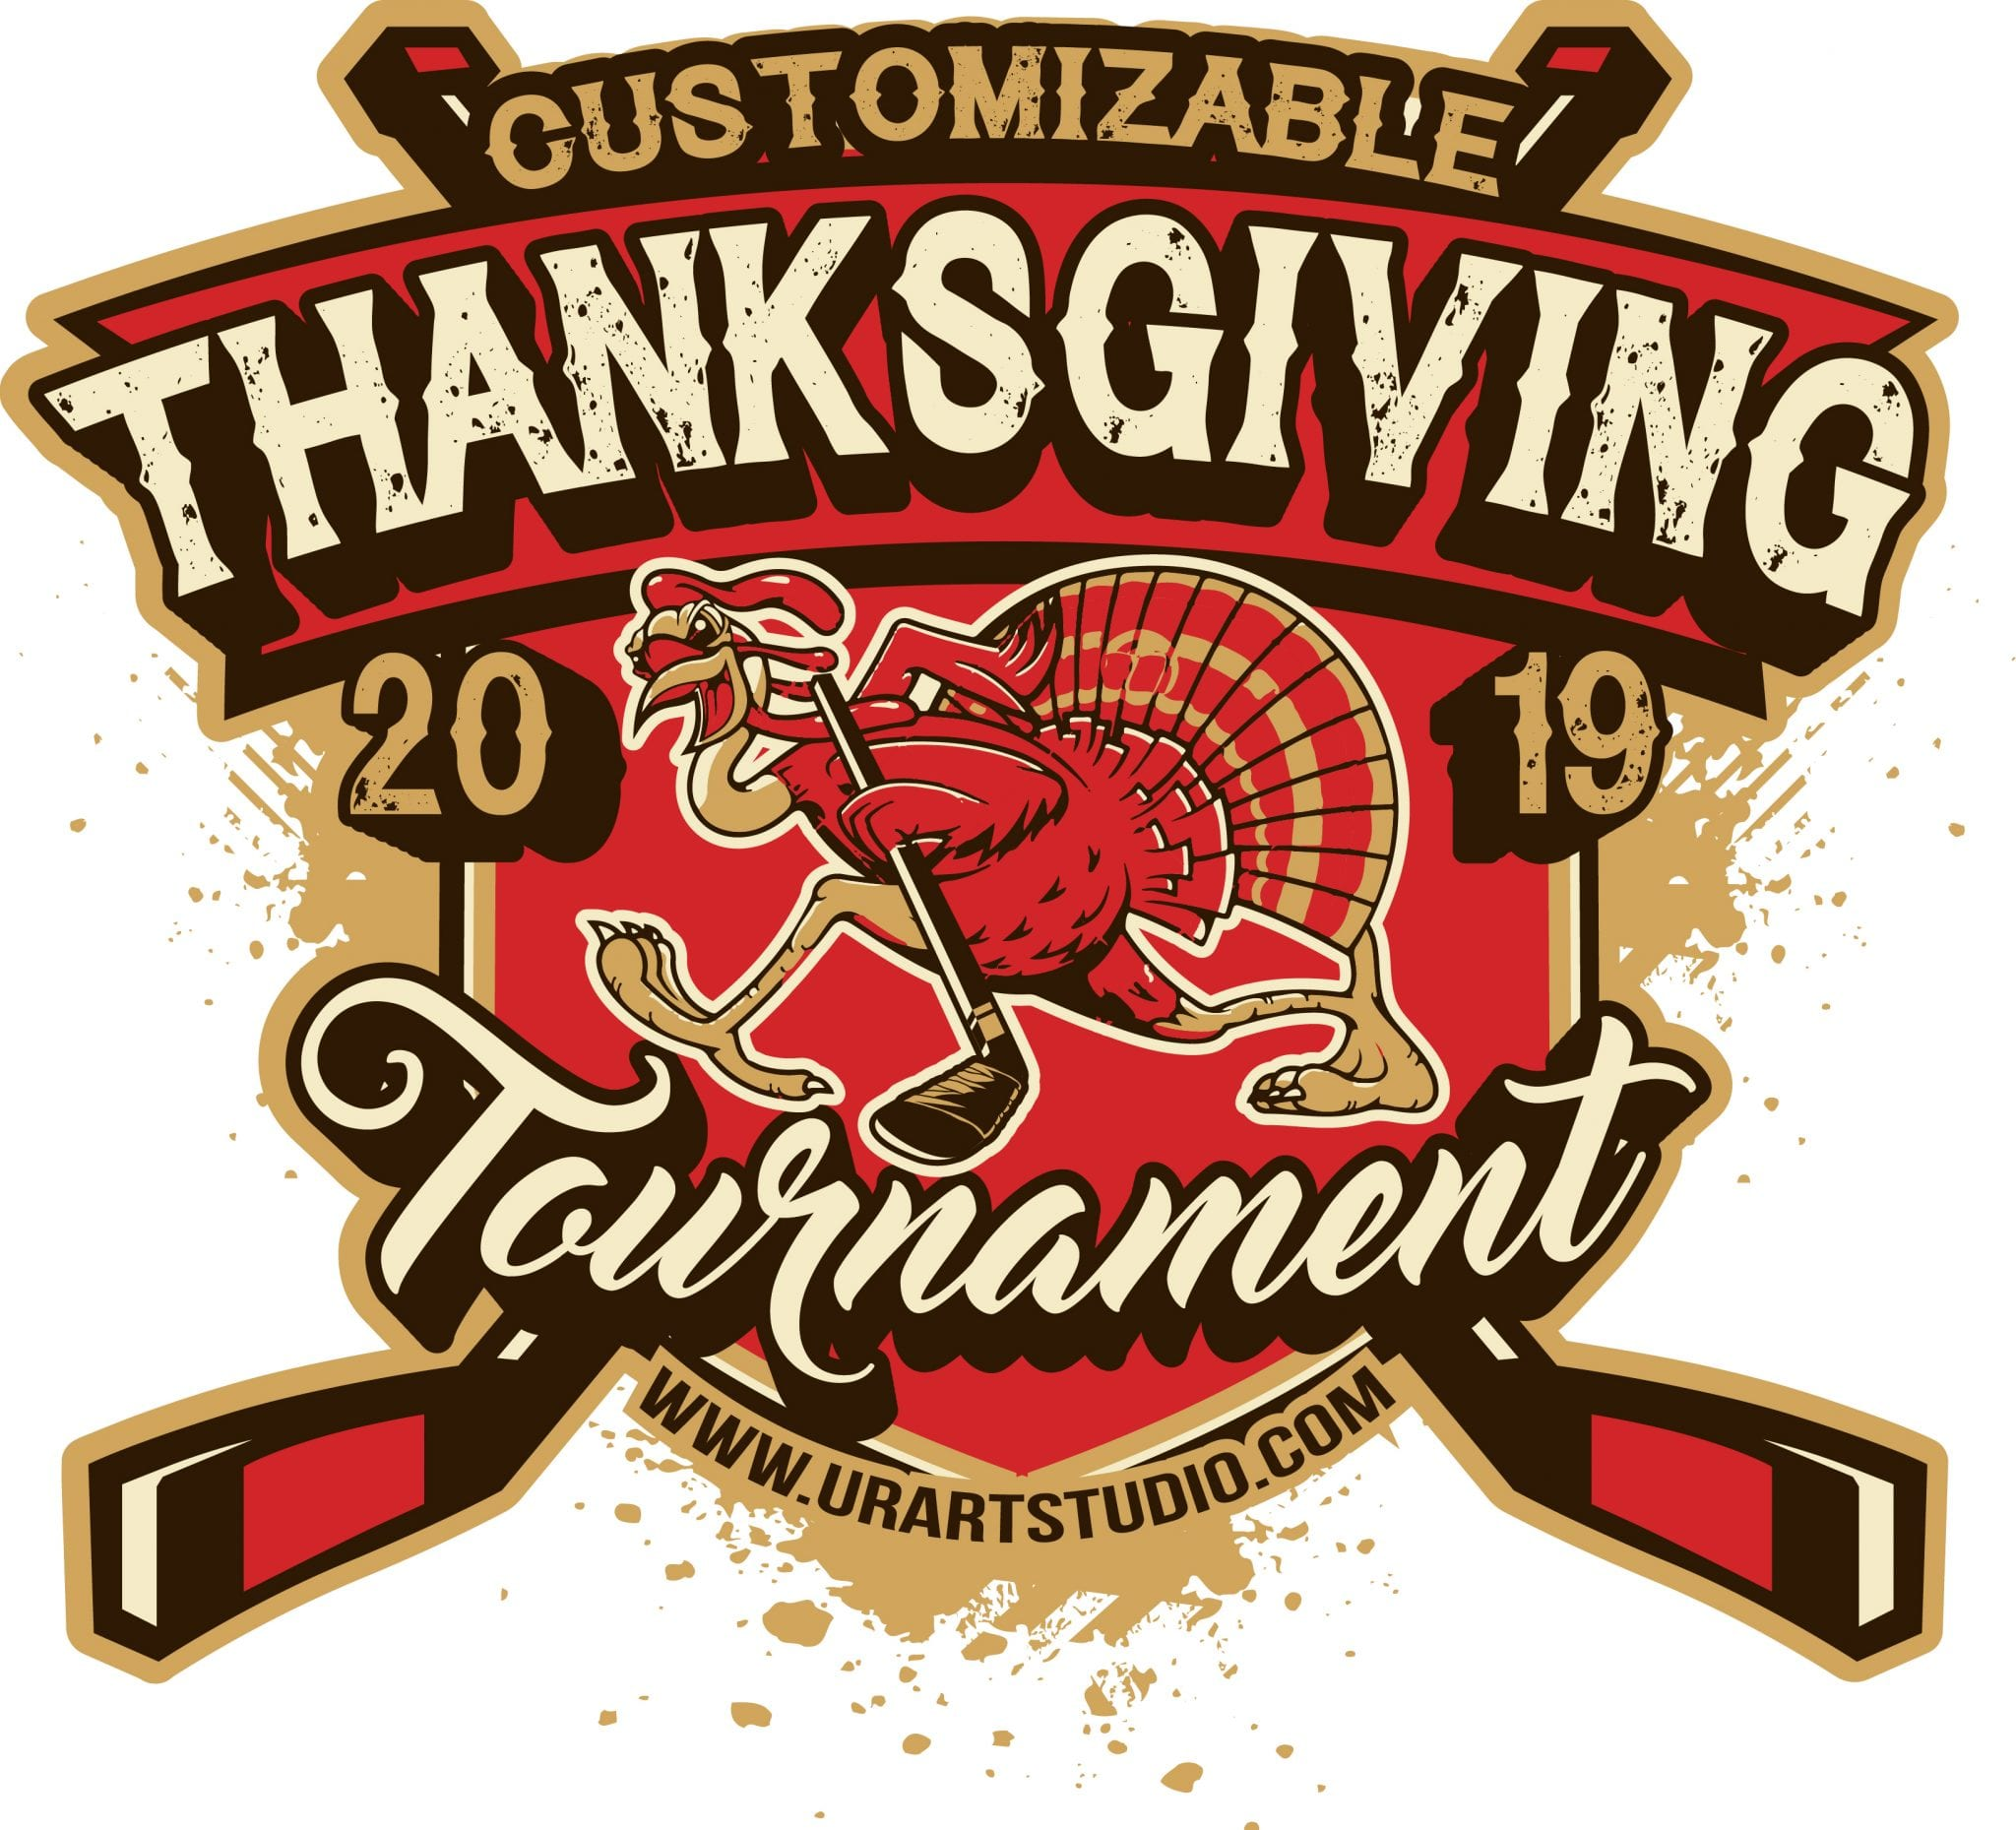 Thanksgiving Hockey Tournament Customizable T Shirt Vector Logo